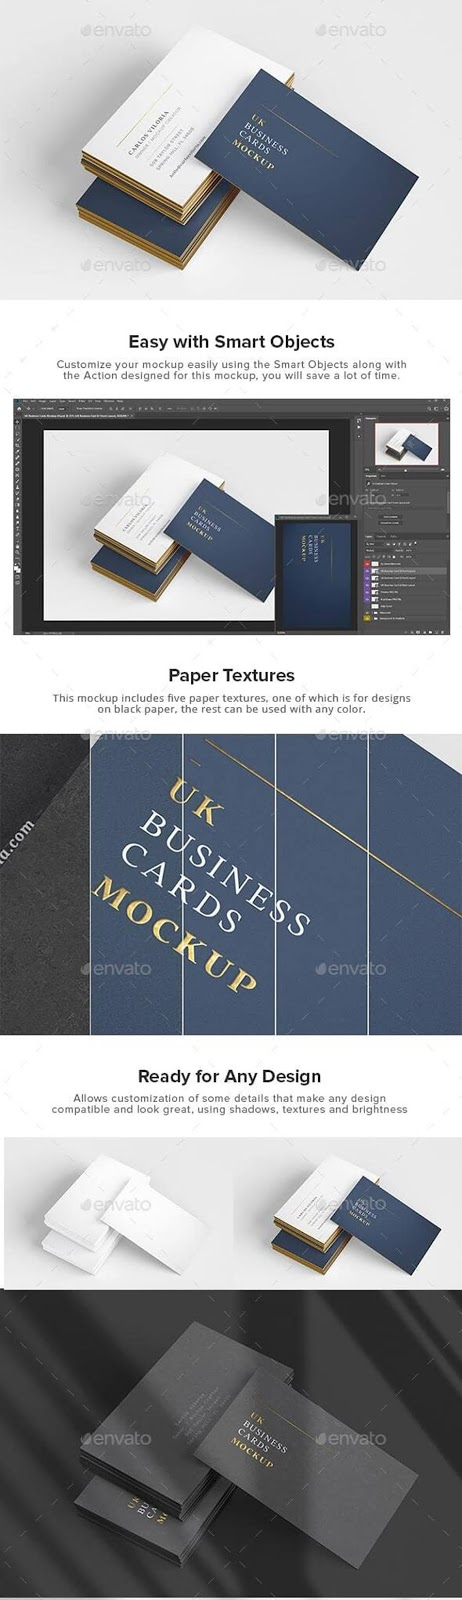 UK Business Cards Mockup 09 27826545